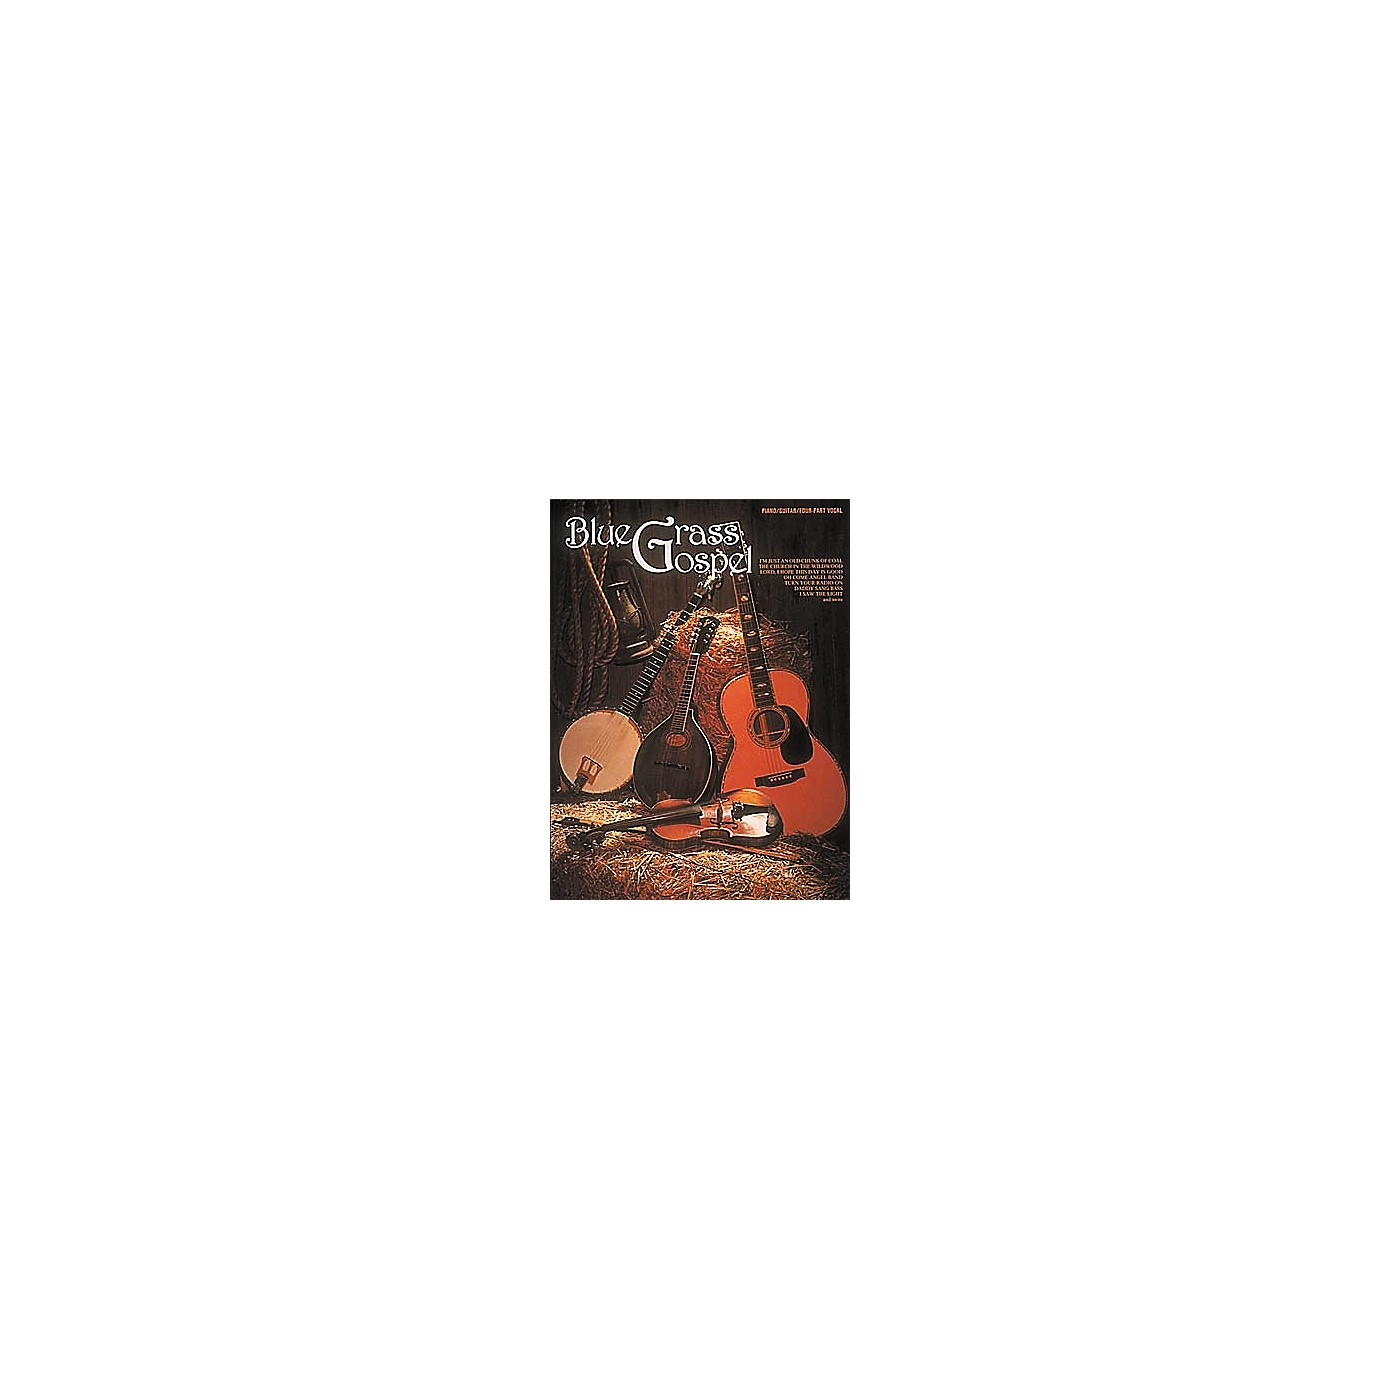 Hal Leonard Blue Grass Gospel Piano/Vocal/Guitar Songbook thumbnail